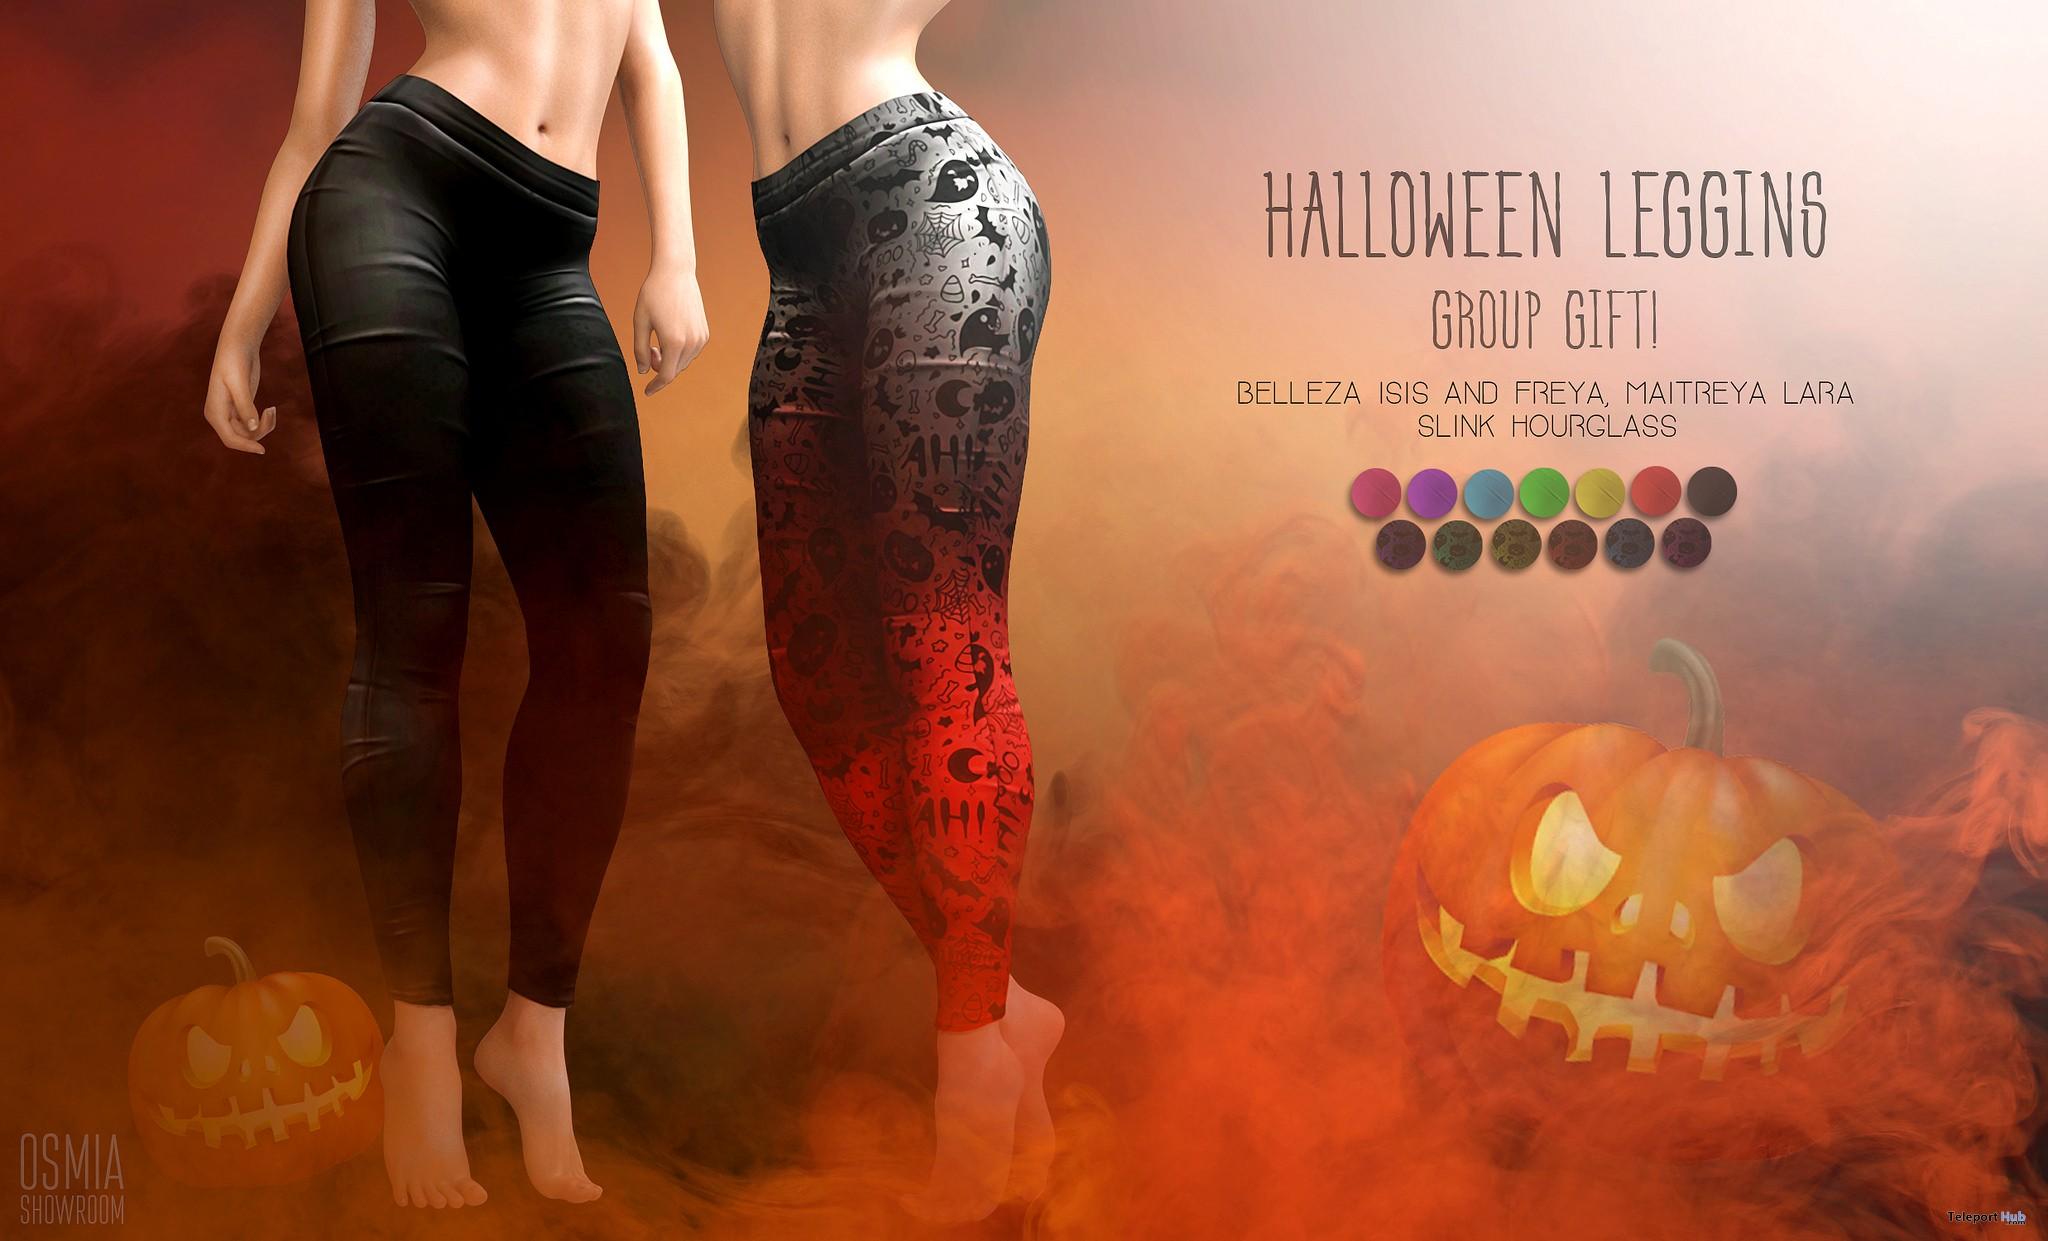 Halloween Leggings Fatpack October 2017 Group Gift by OSMIA - Teleport Hub - teleporthub.com